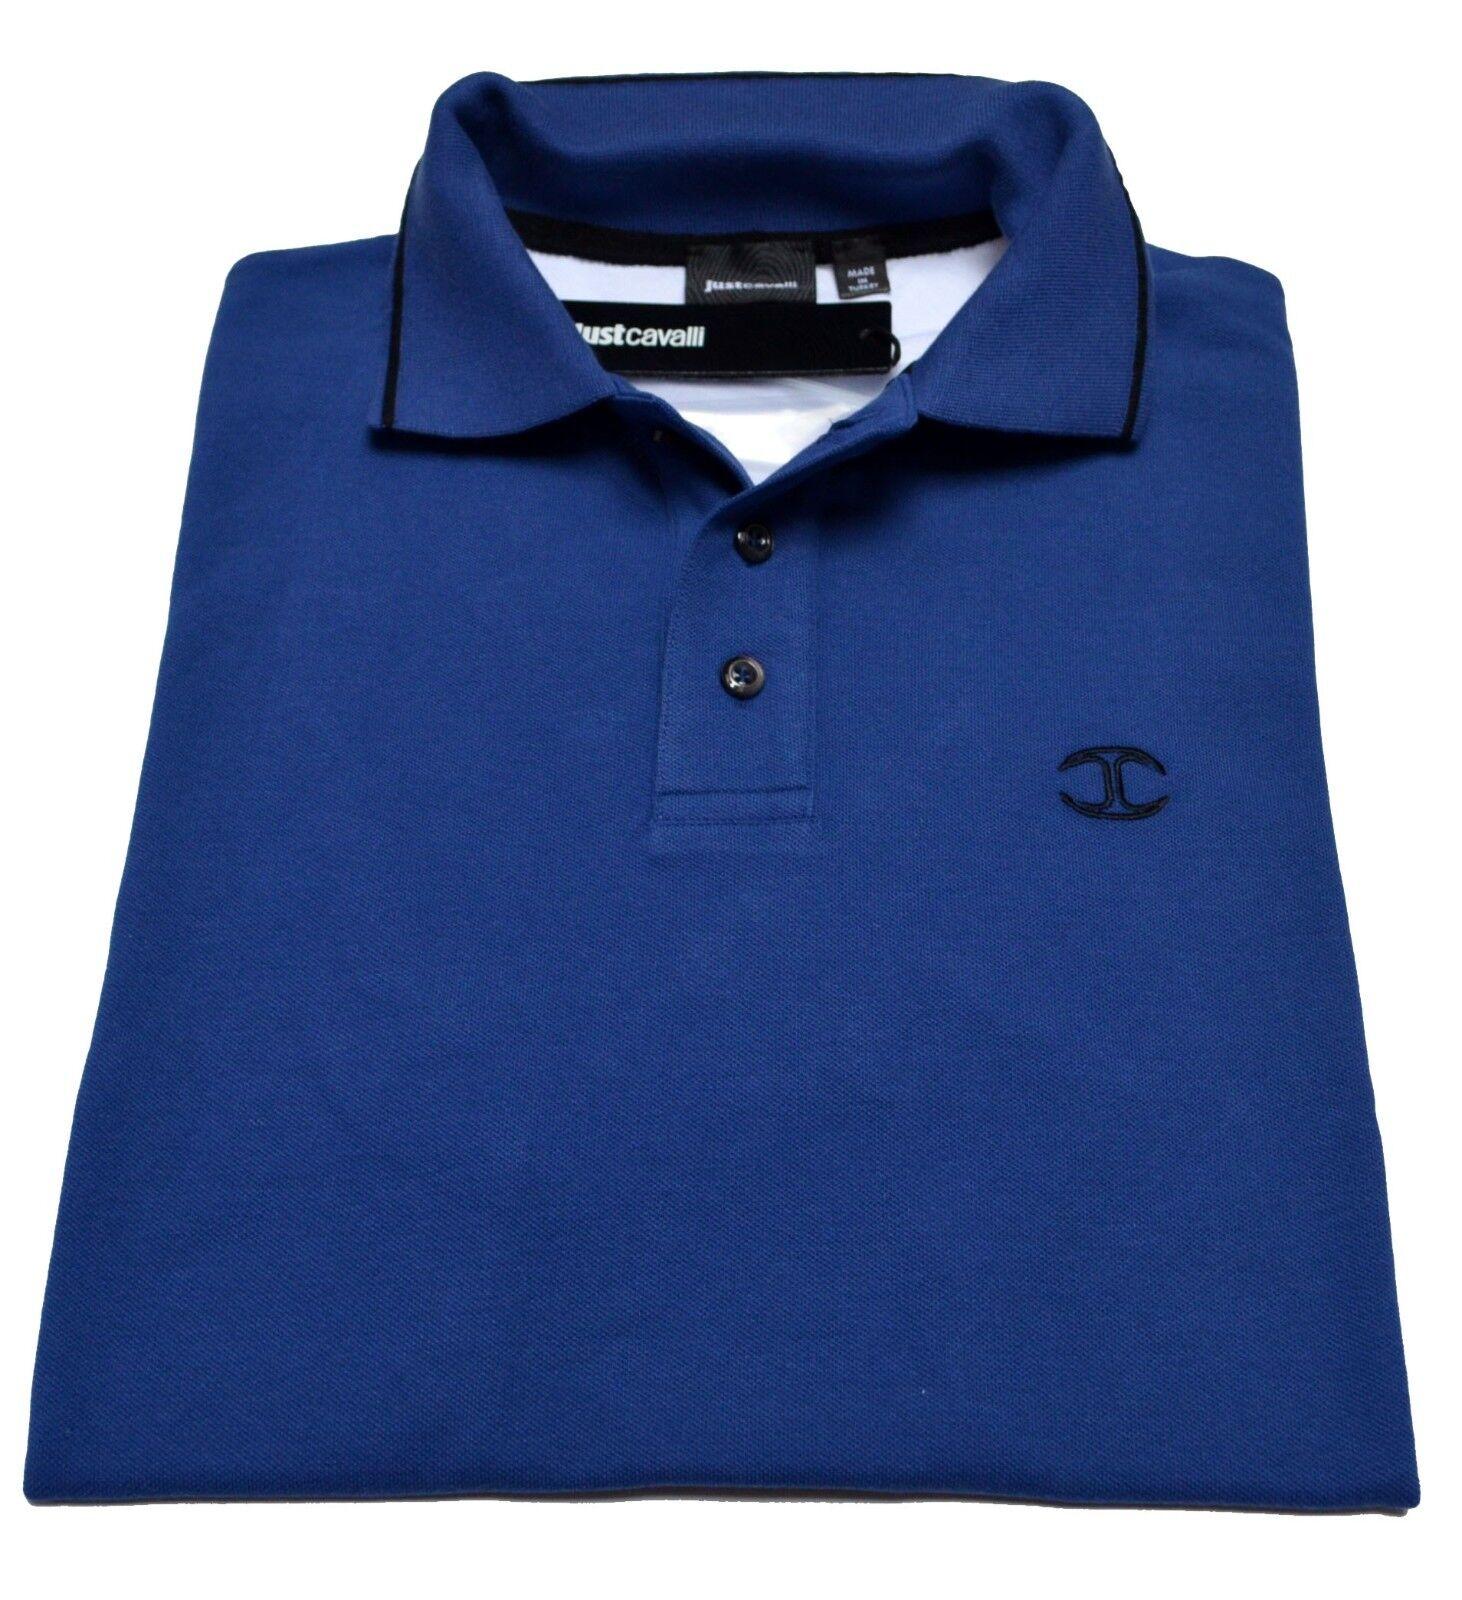 Polo Roberto Cavalli Class Logo Men Fashion T-shirt Tee Blau Mens 100% genuine